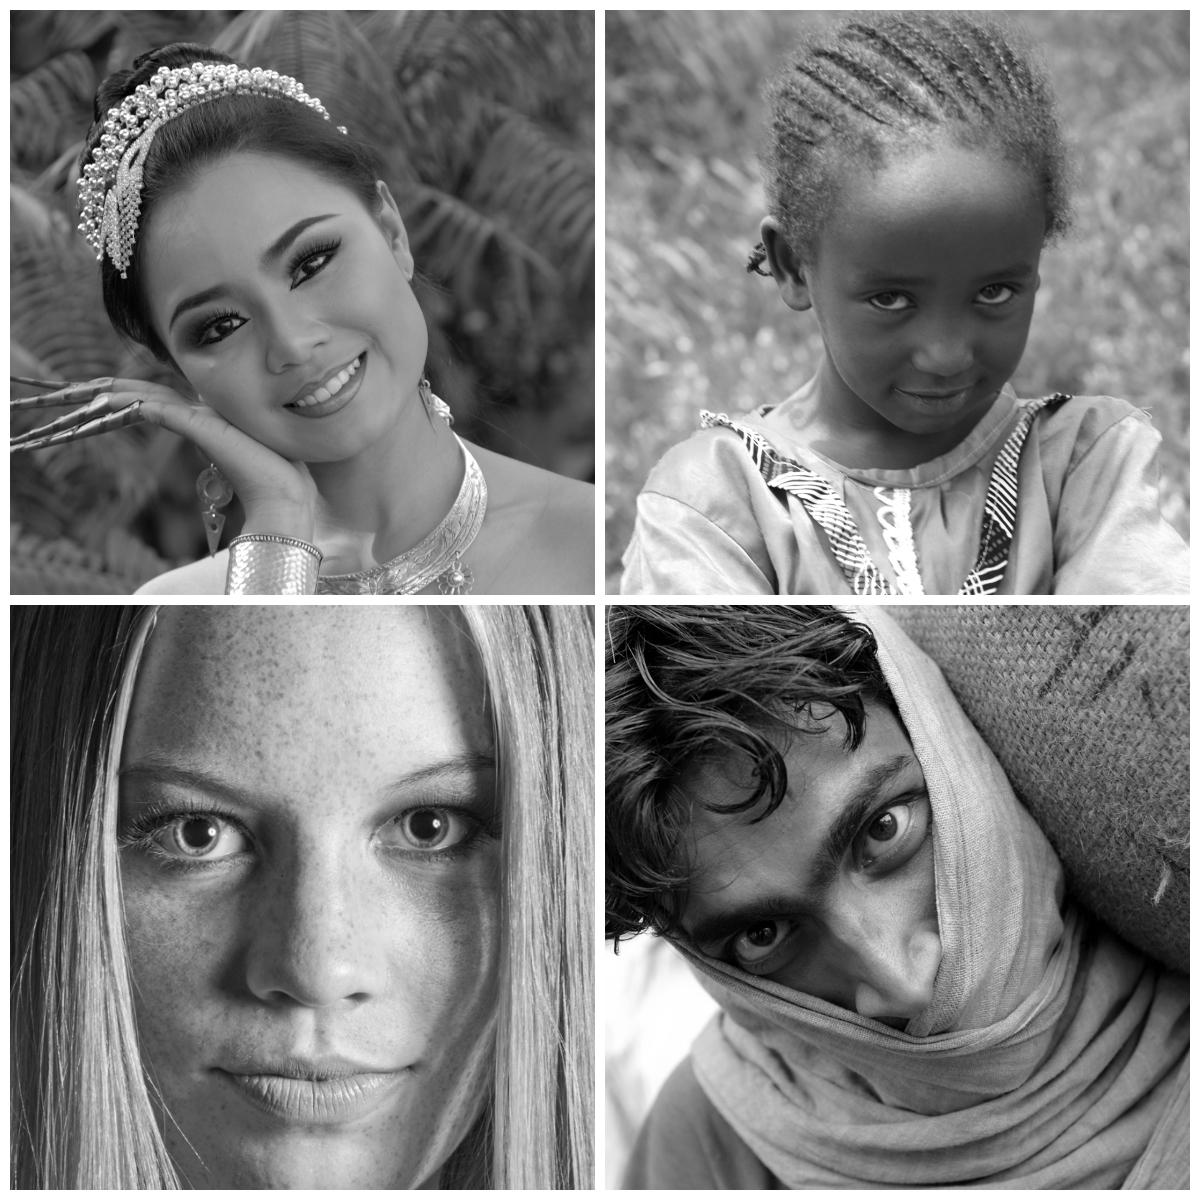 Faces By Michelle Chaplow